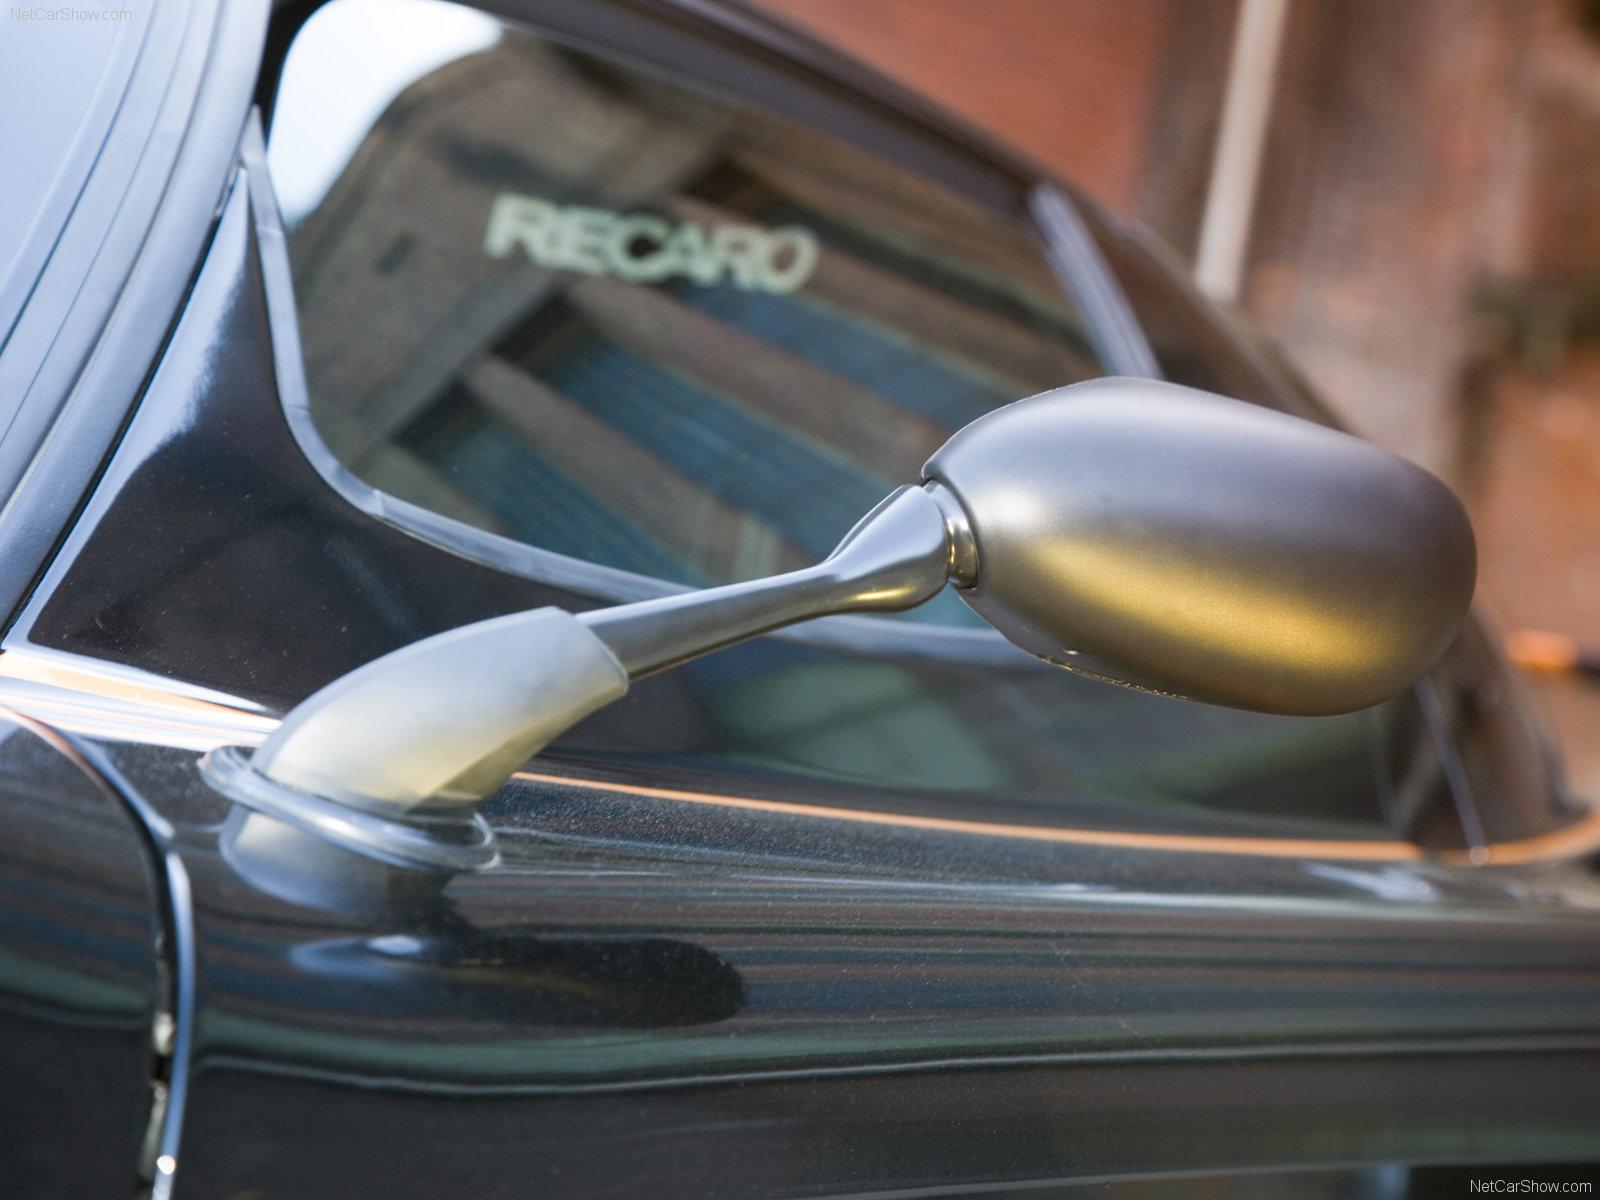 Hình ảnh siêu xe Edo Maserati MC12 XX 2006 & nội ngoại thất